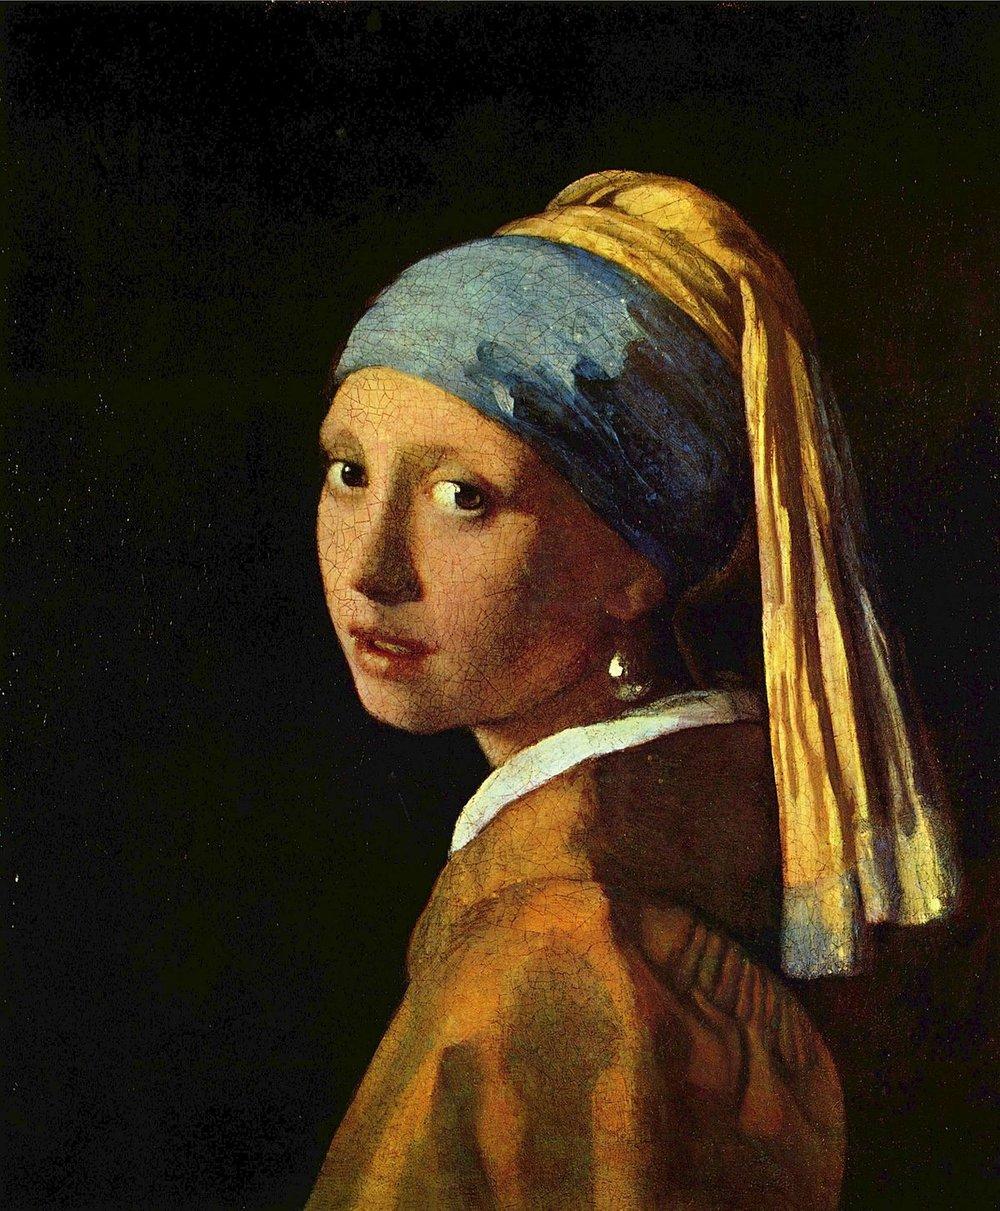 1200px-Jan_Vermeer_van_Delft_007.jpg